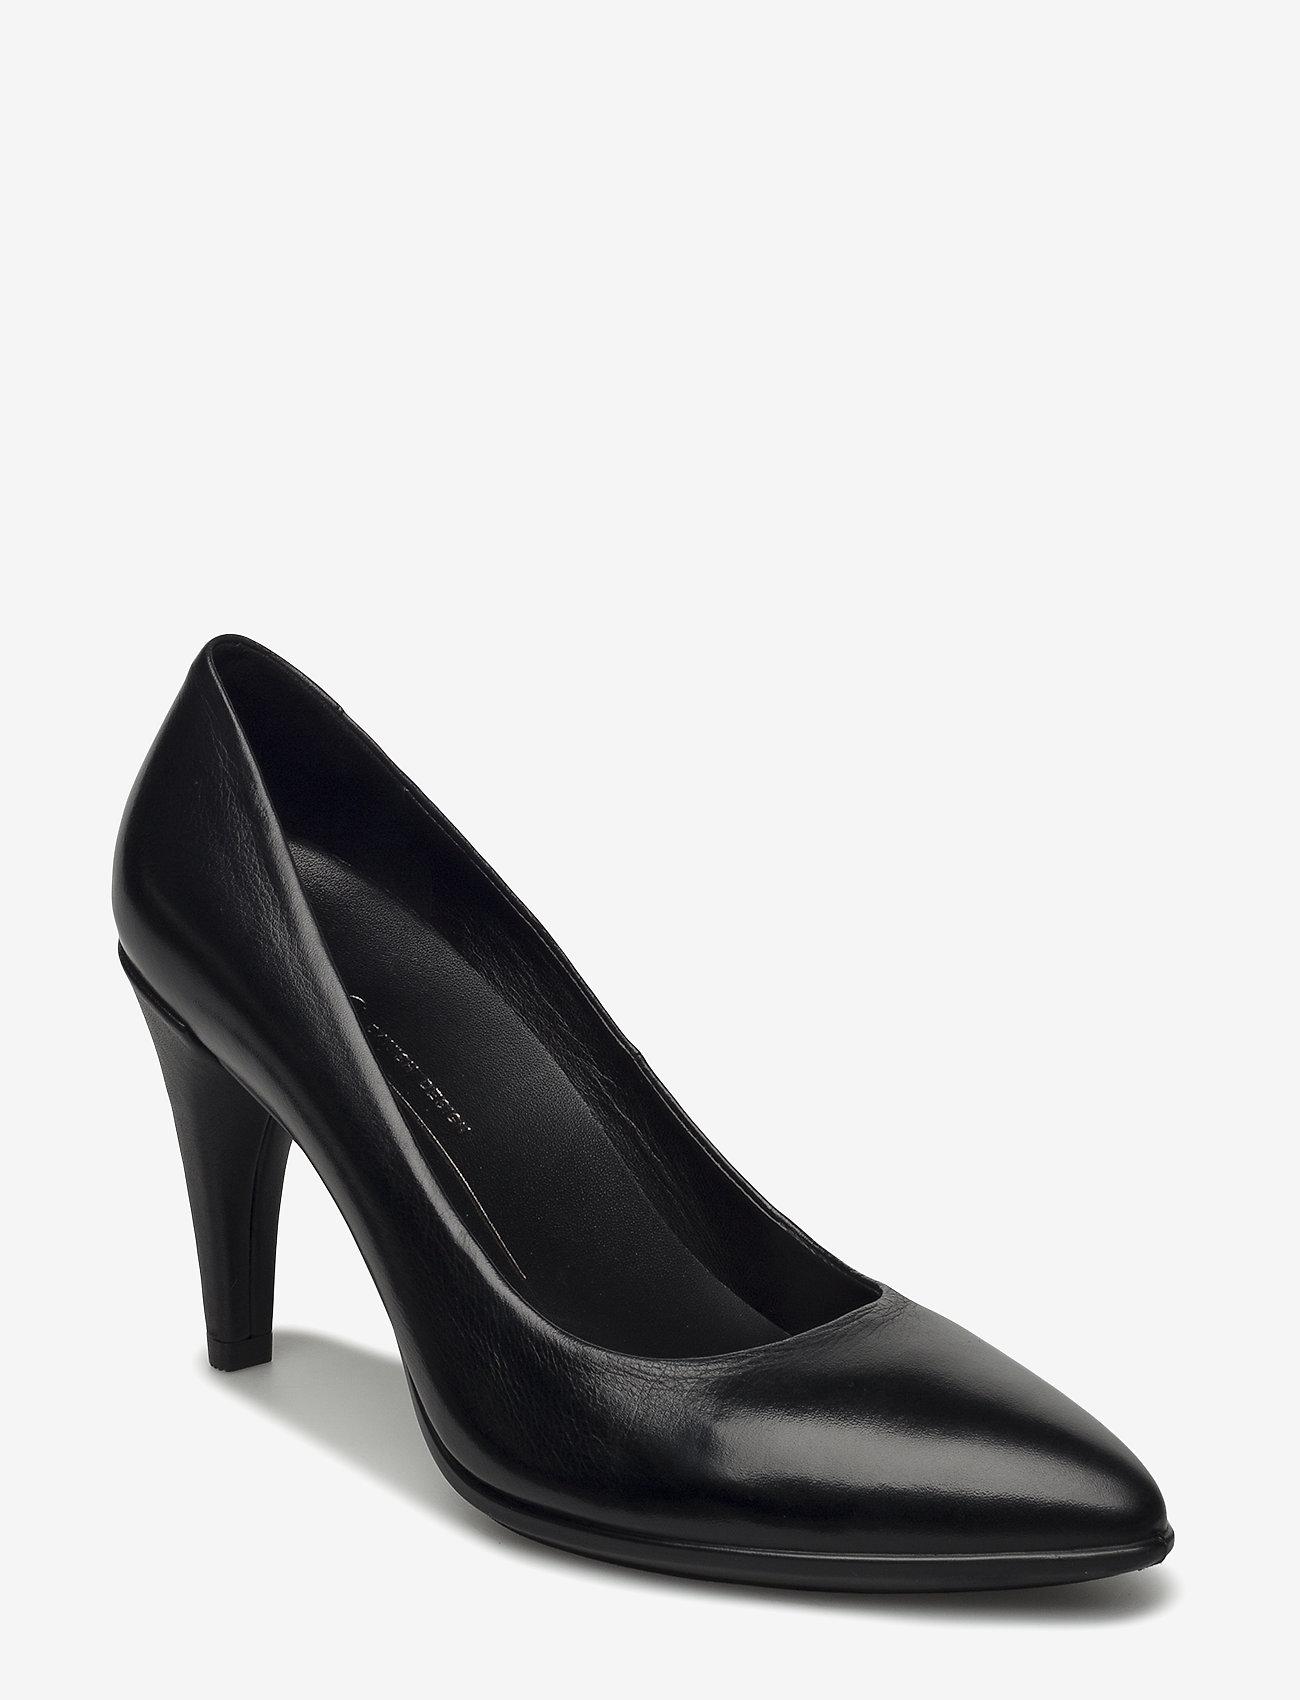 ECCO - SHAPE 75 POINTY - klasiski augstpapēžu apavi - black - 0